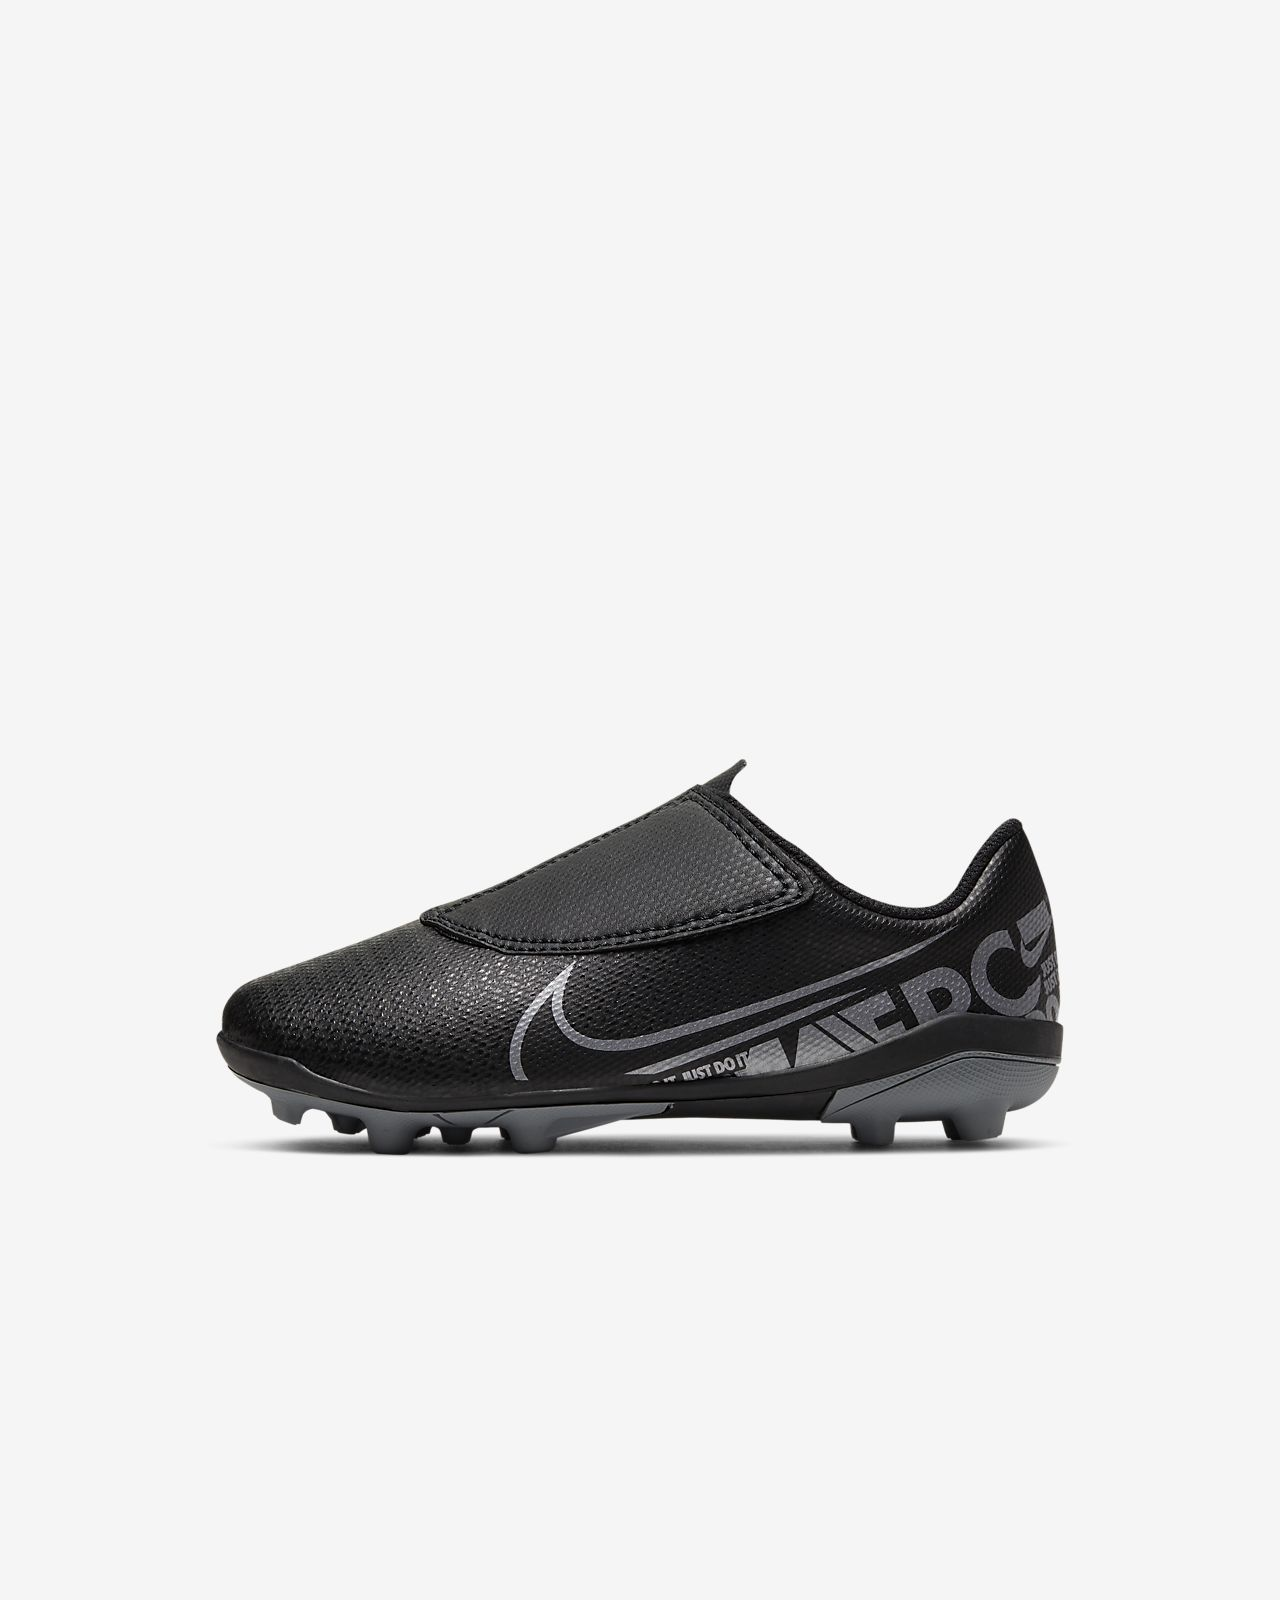 Nike Jr. Mercurial Vapor 13 Club MG-fodboldstøvlen til små og store børn (flere typer underlag)